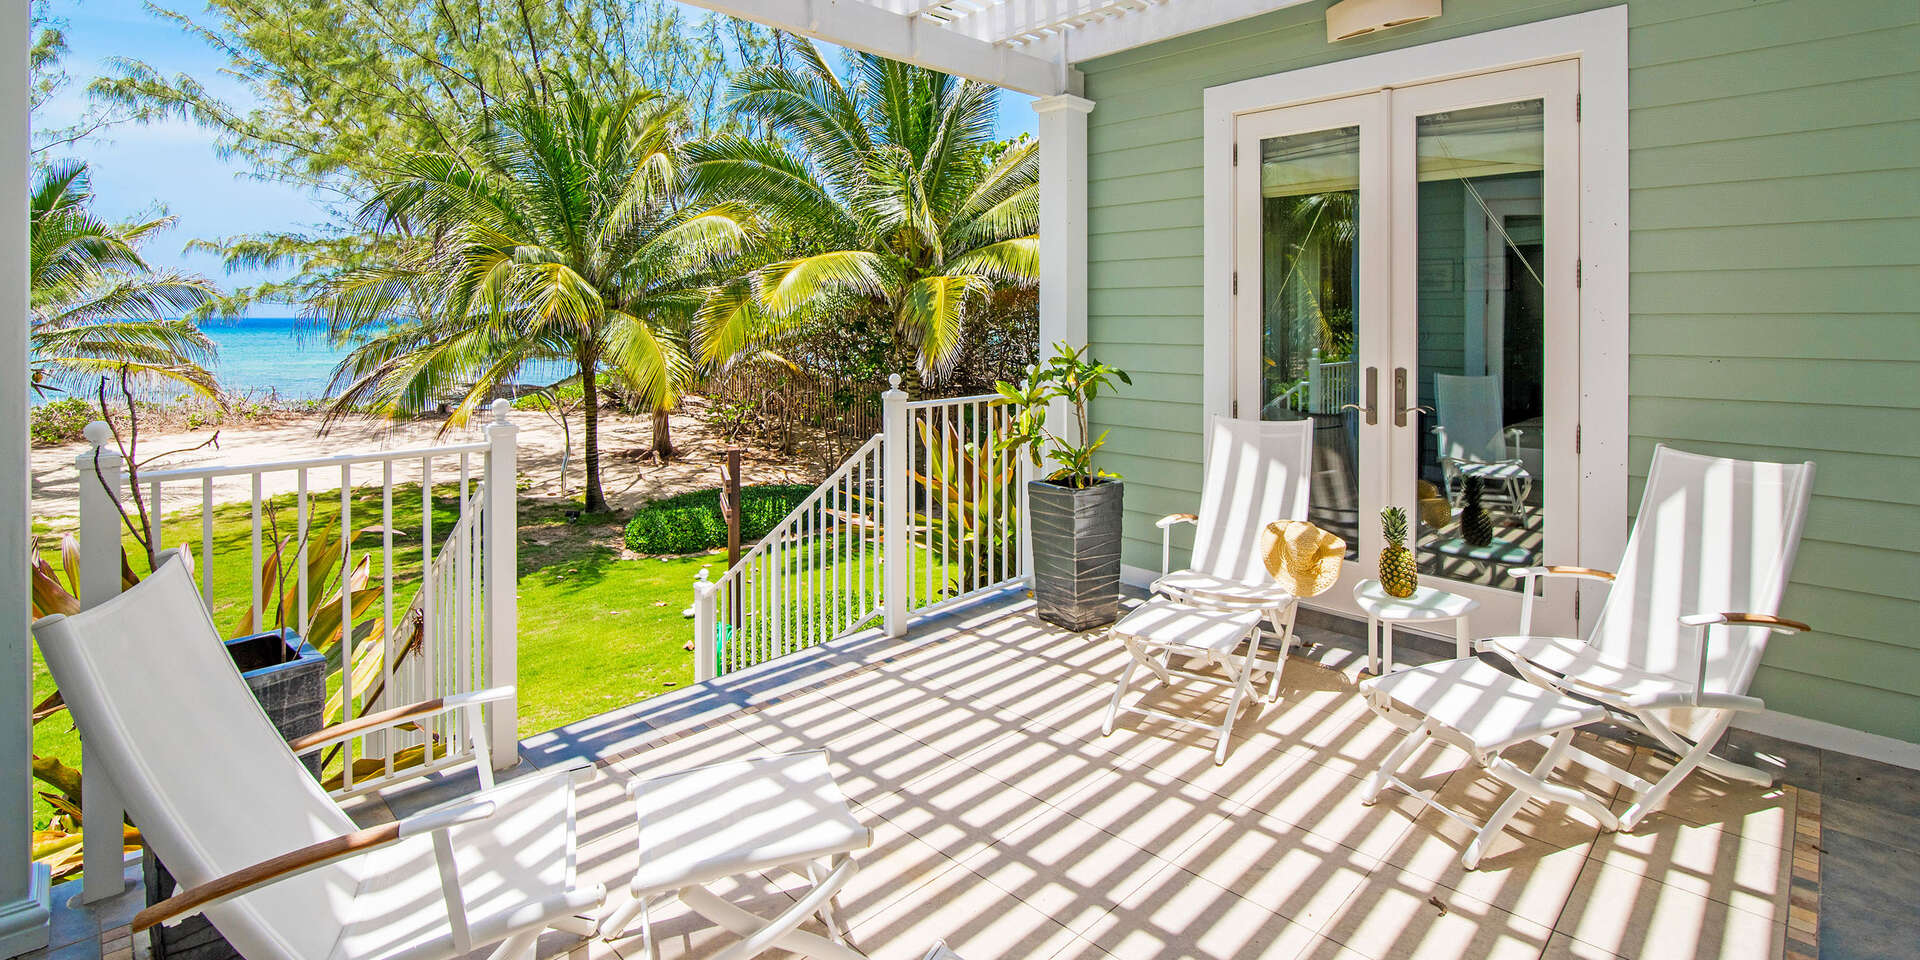 Luxury villa rentals caribbean - Cayman islands - Grand cayman - West bay - Avocado Cottage - Image 1/8